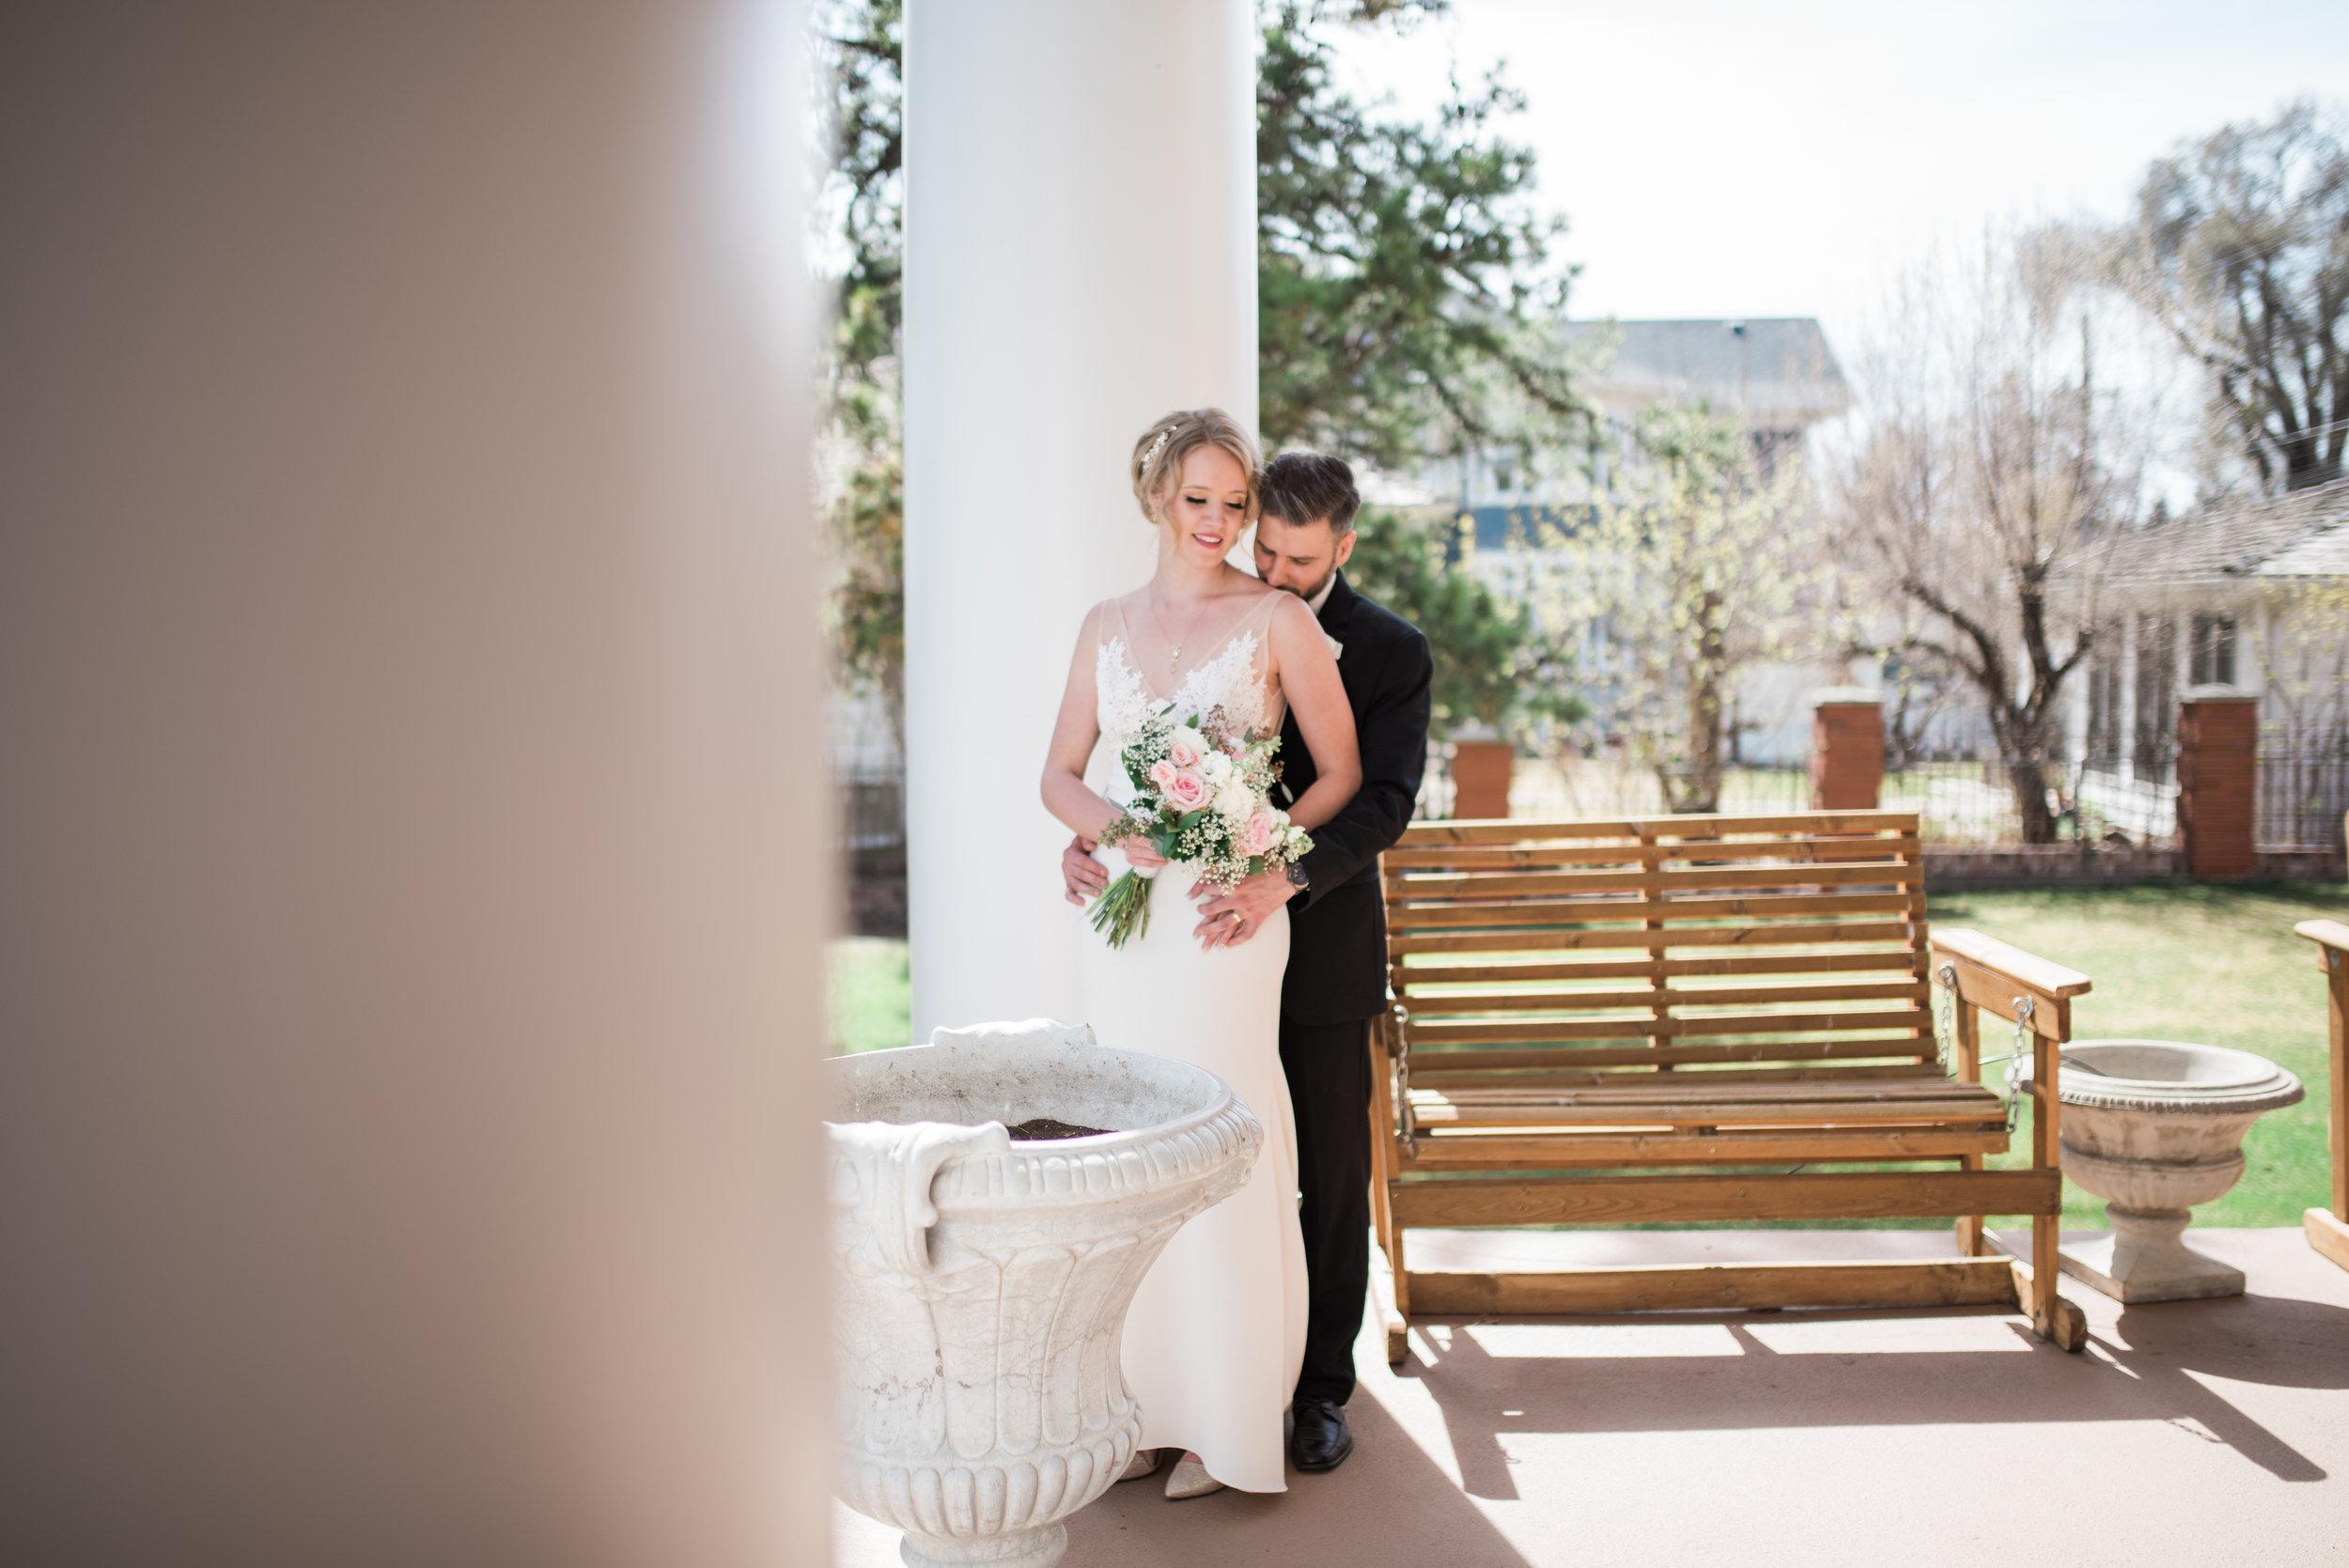 Ali Samantha Wedding 1112.jpg